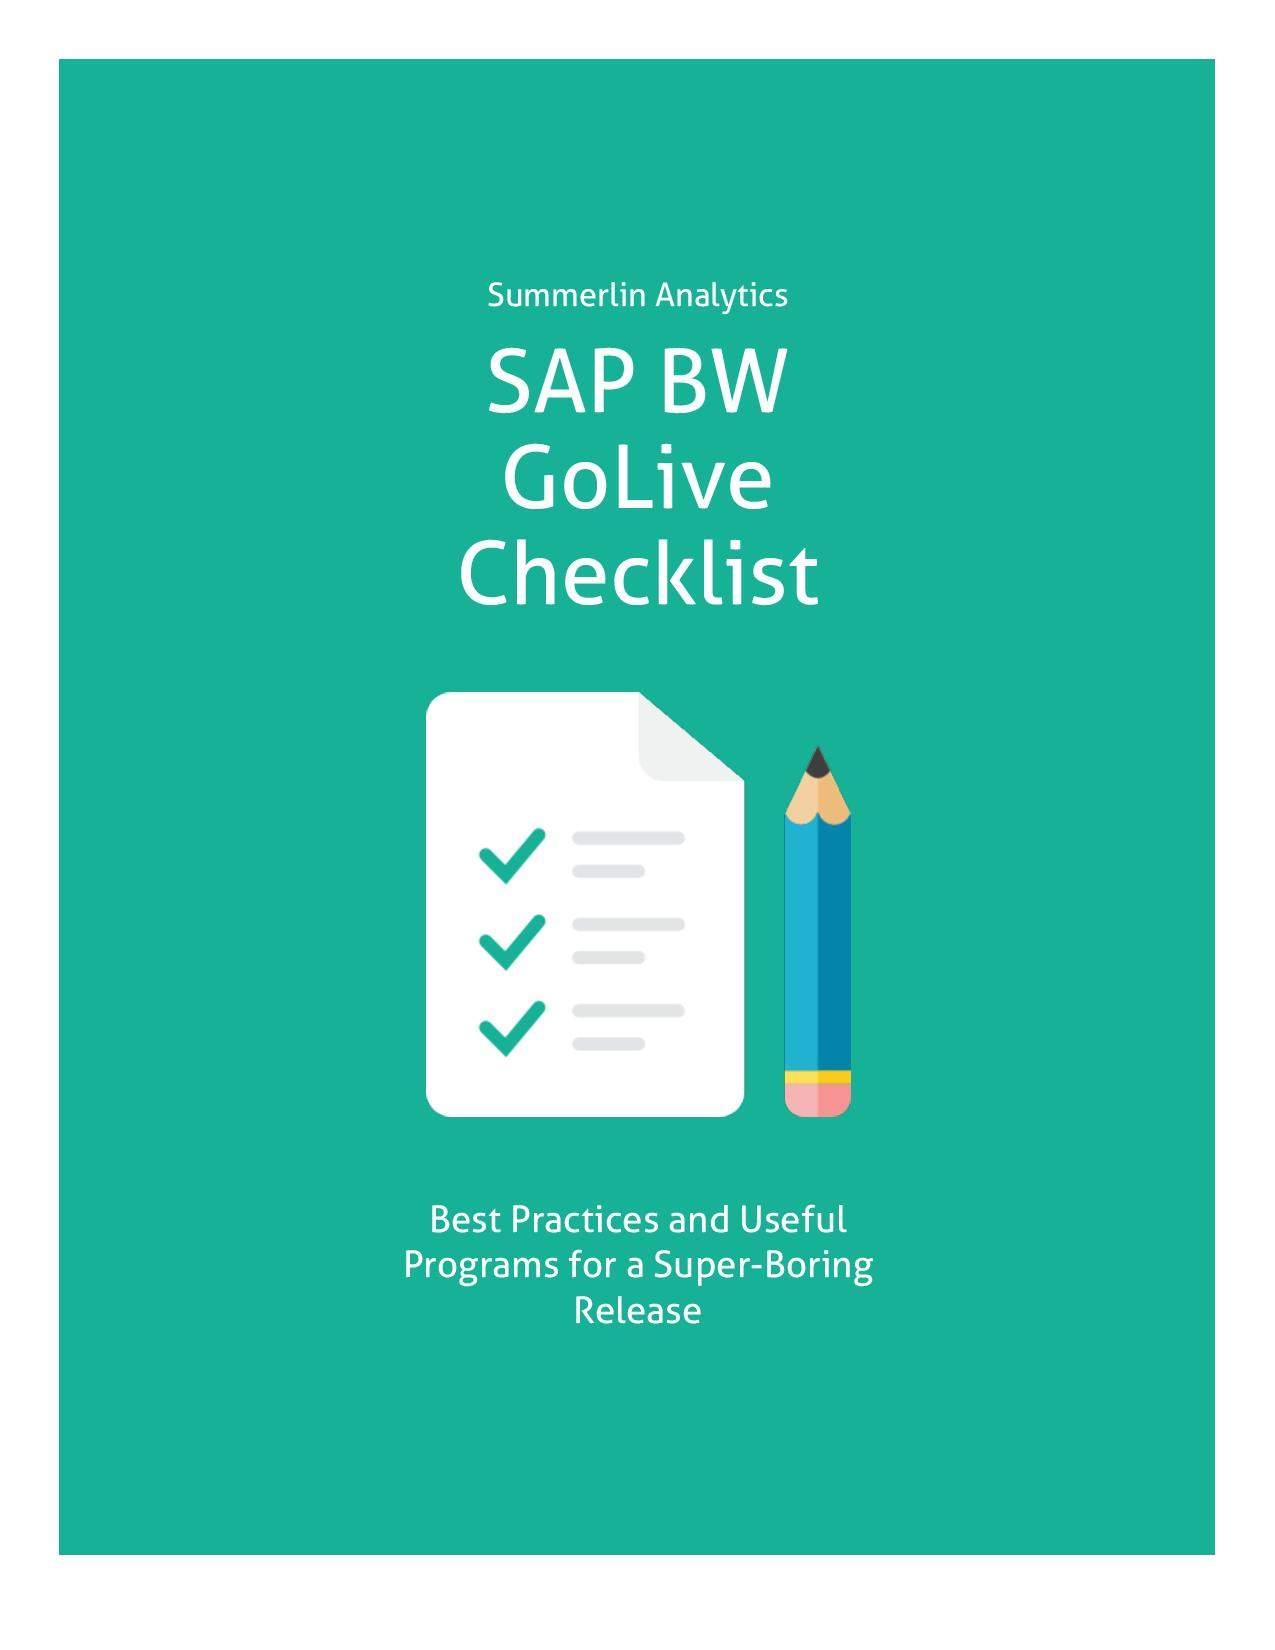 PPT - Best Practices: Effective Release Management